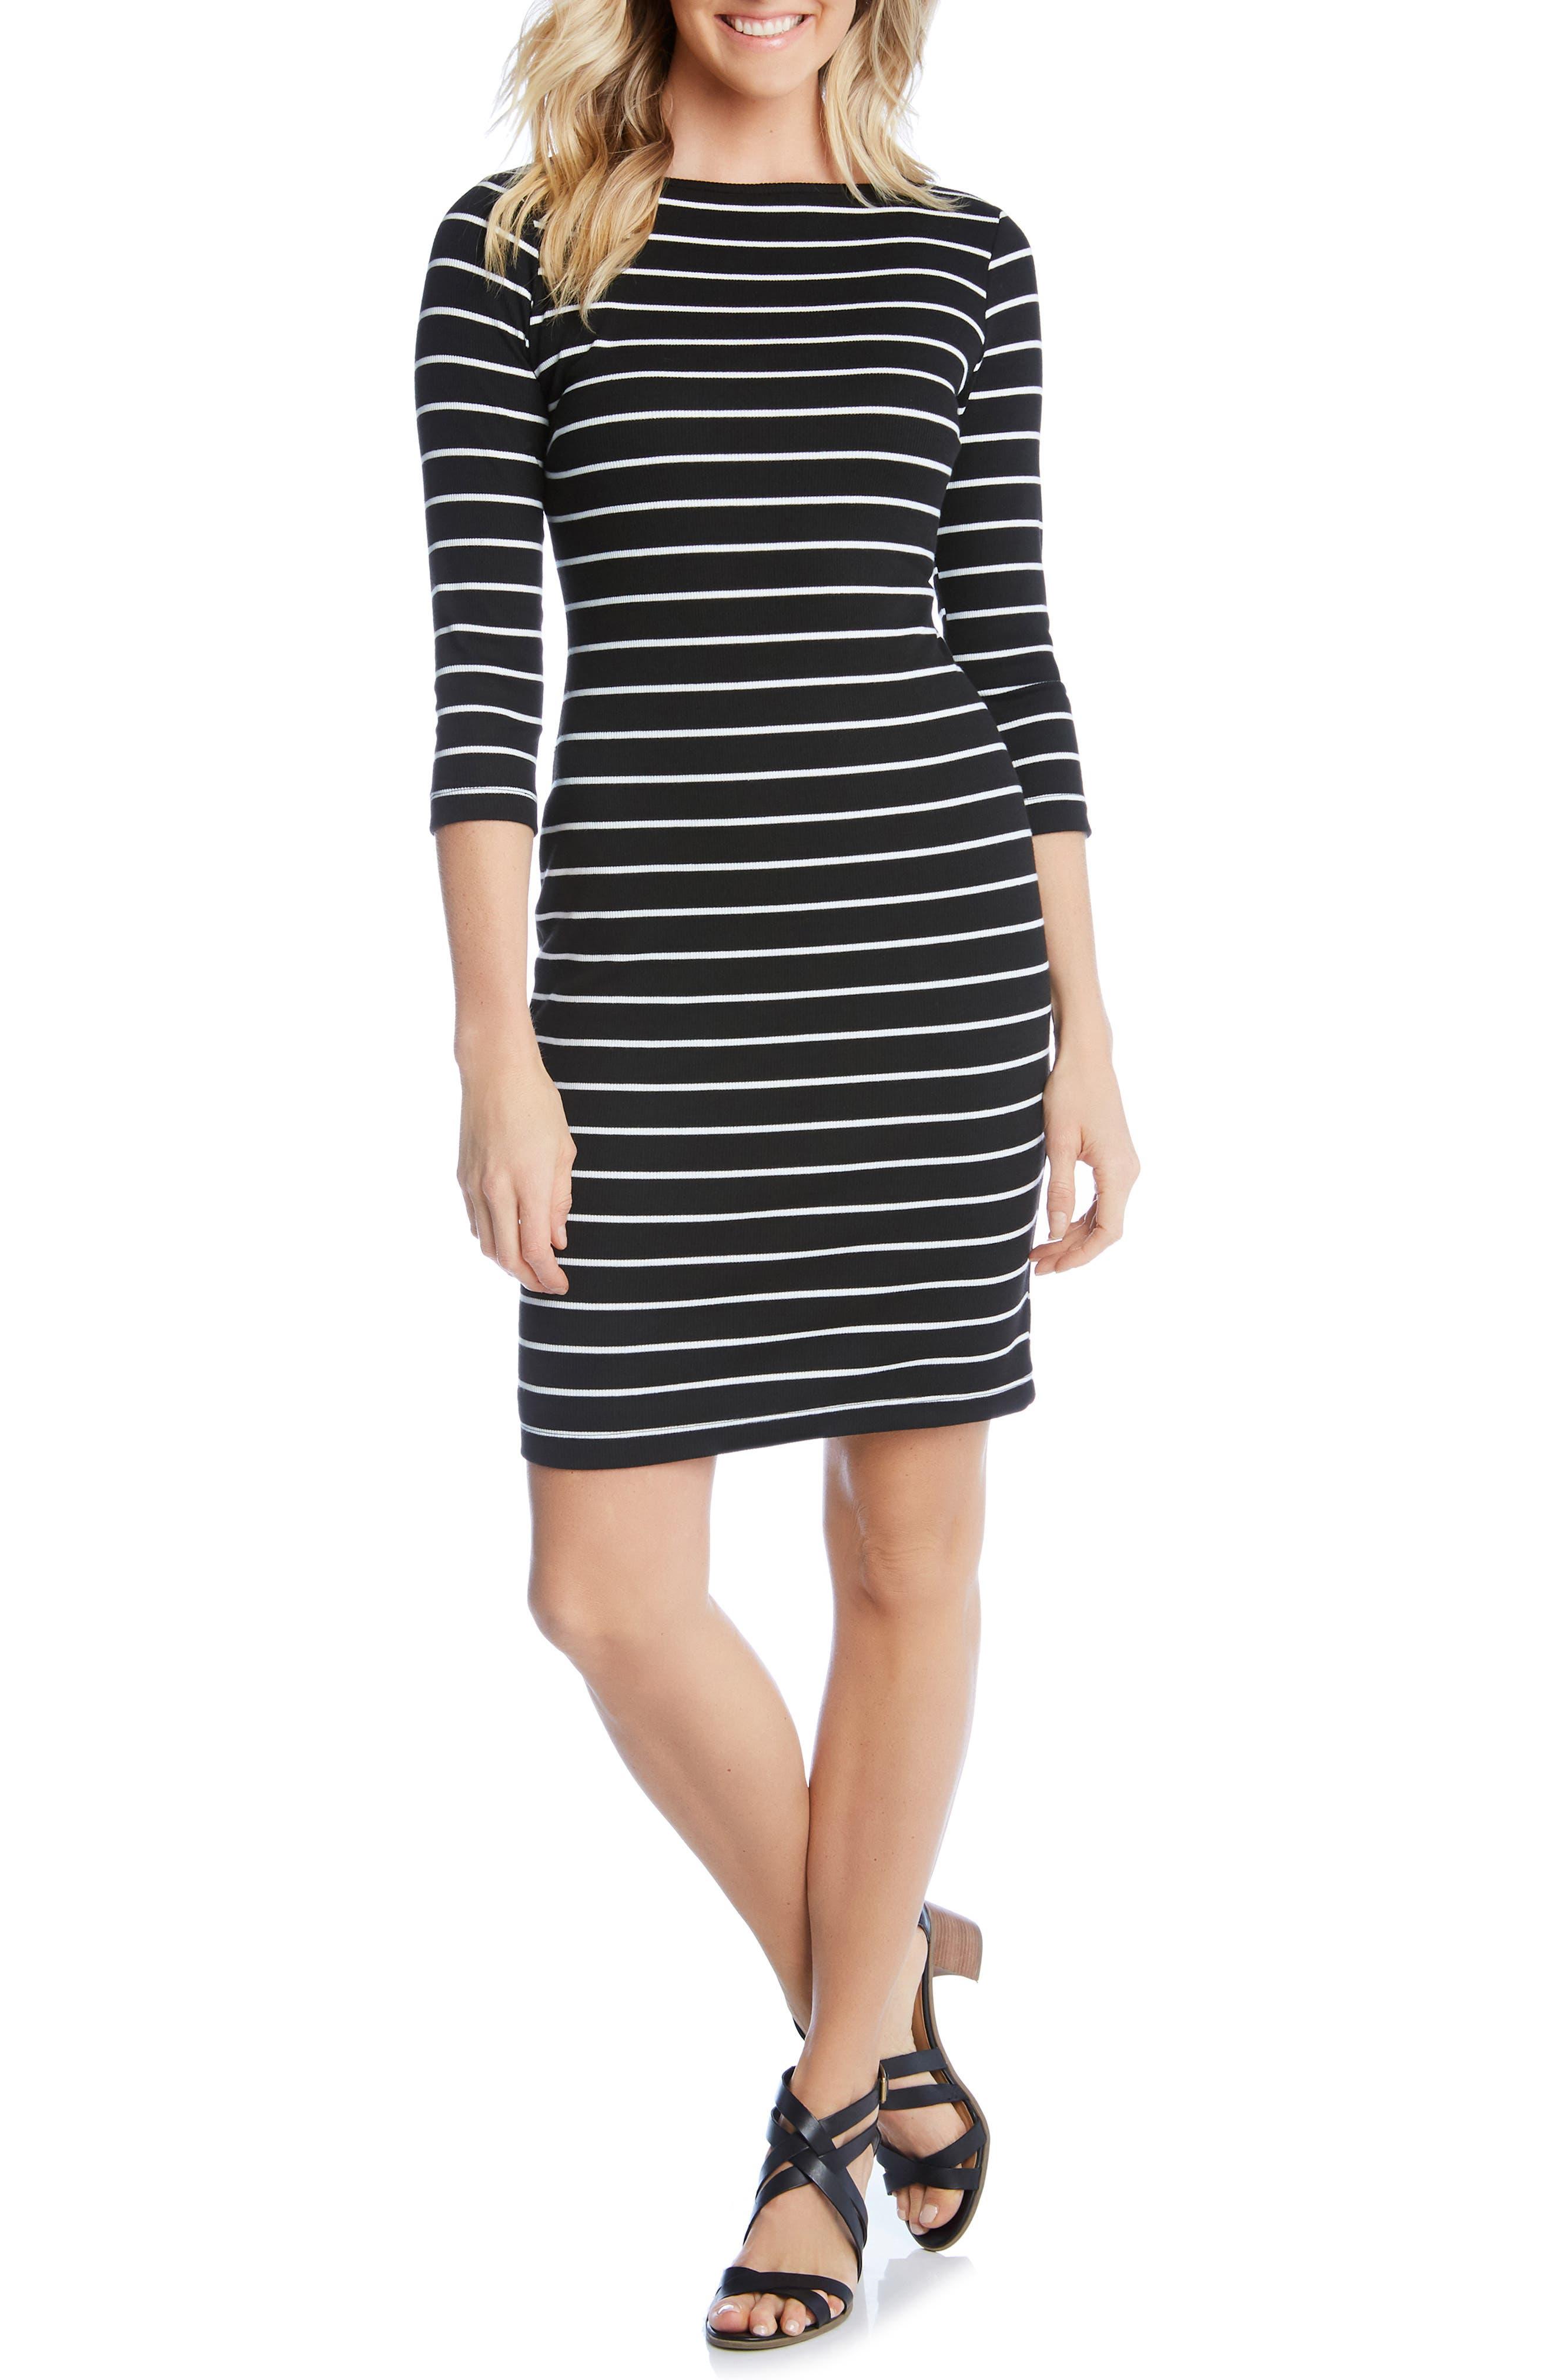 KAREN KANE Stripe Body-Con Dress, Main, color, STRIPE